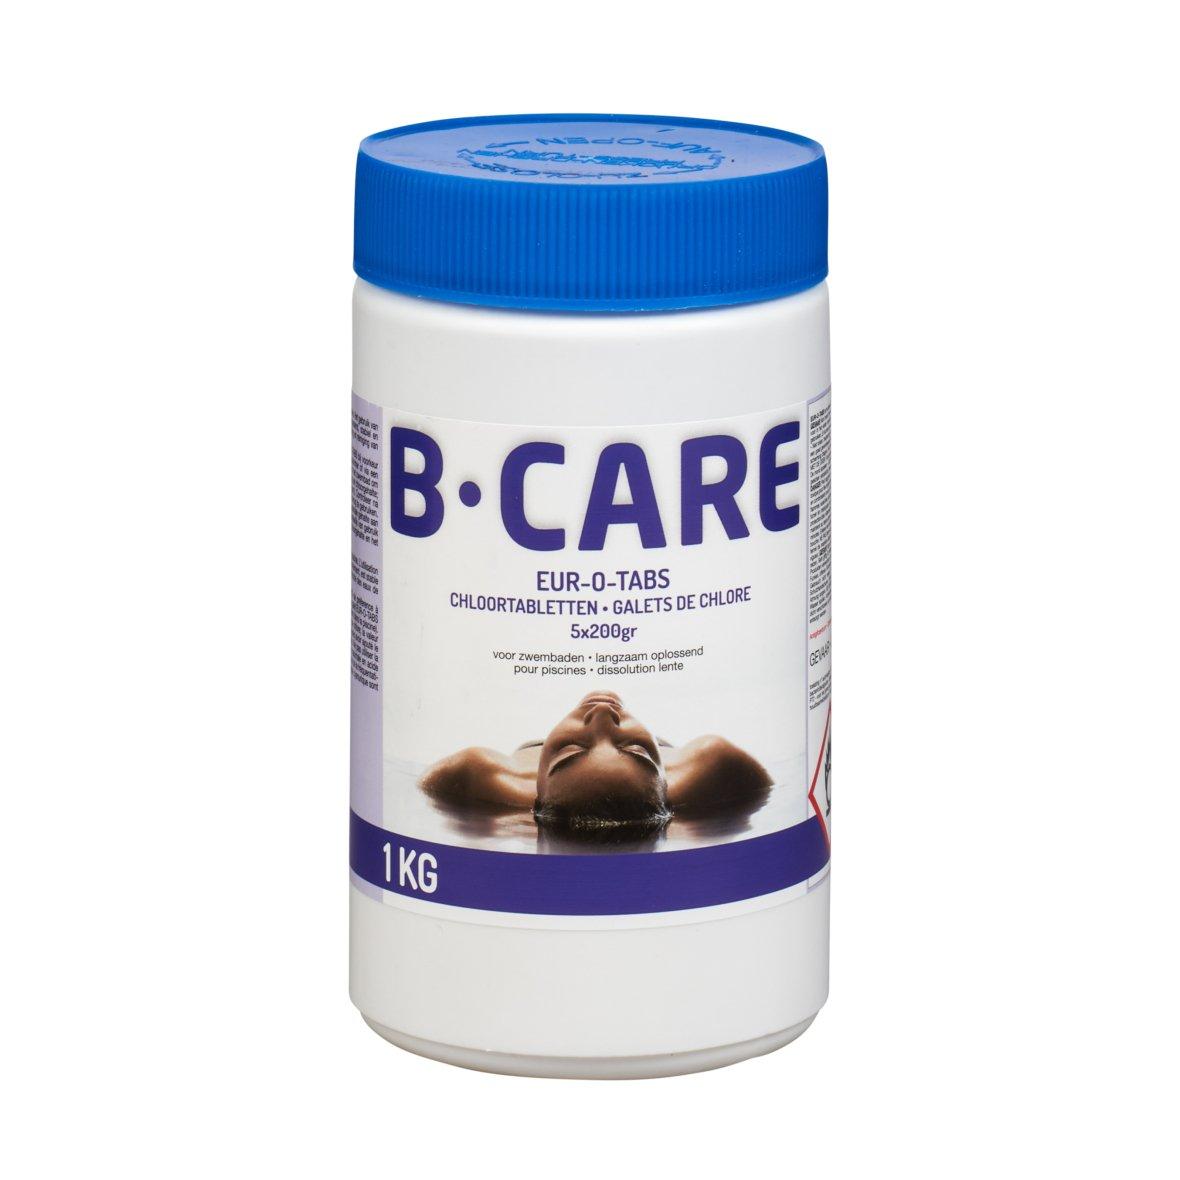 Chloor B-care 1 kg 5 x 200 g